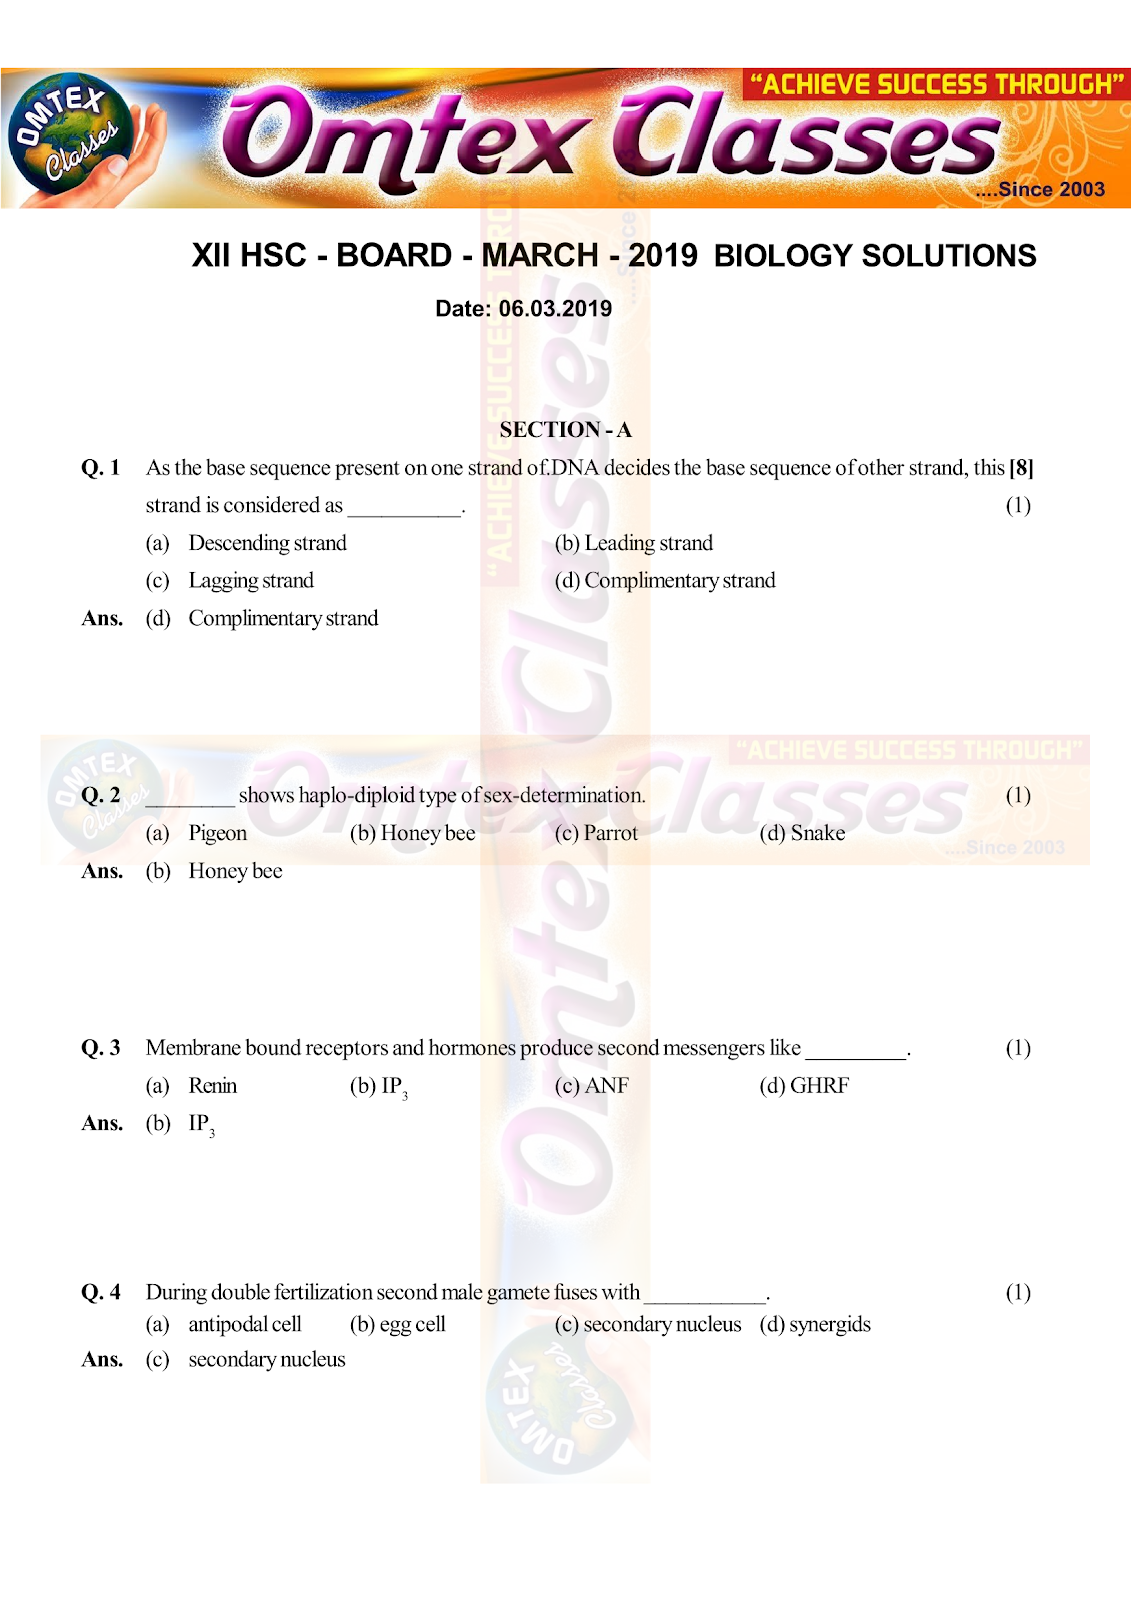 OMTEX CLASSES MAHARASHTRA : XII HSC - BOARD - MARCH - 2019 BIOLOGY